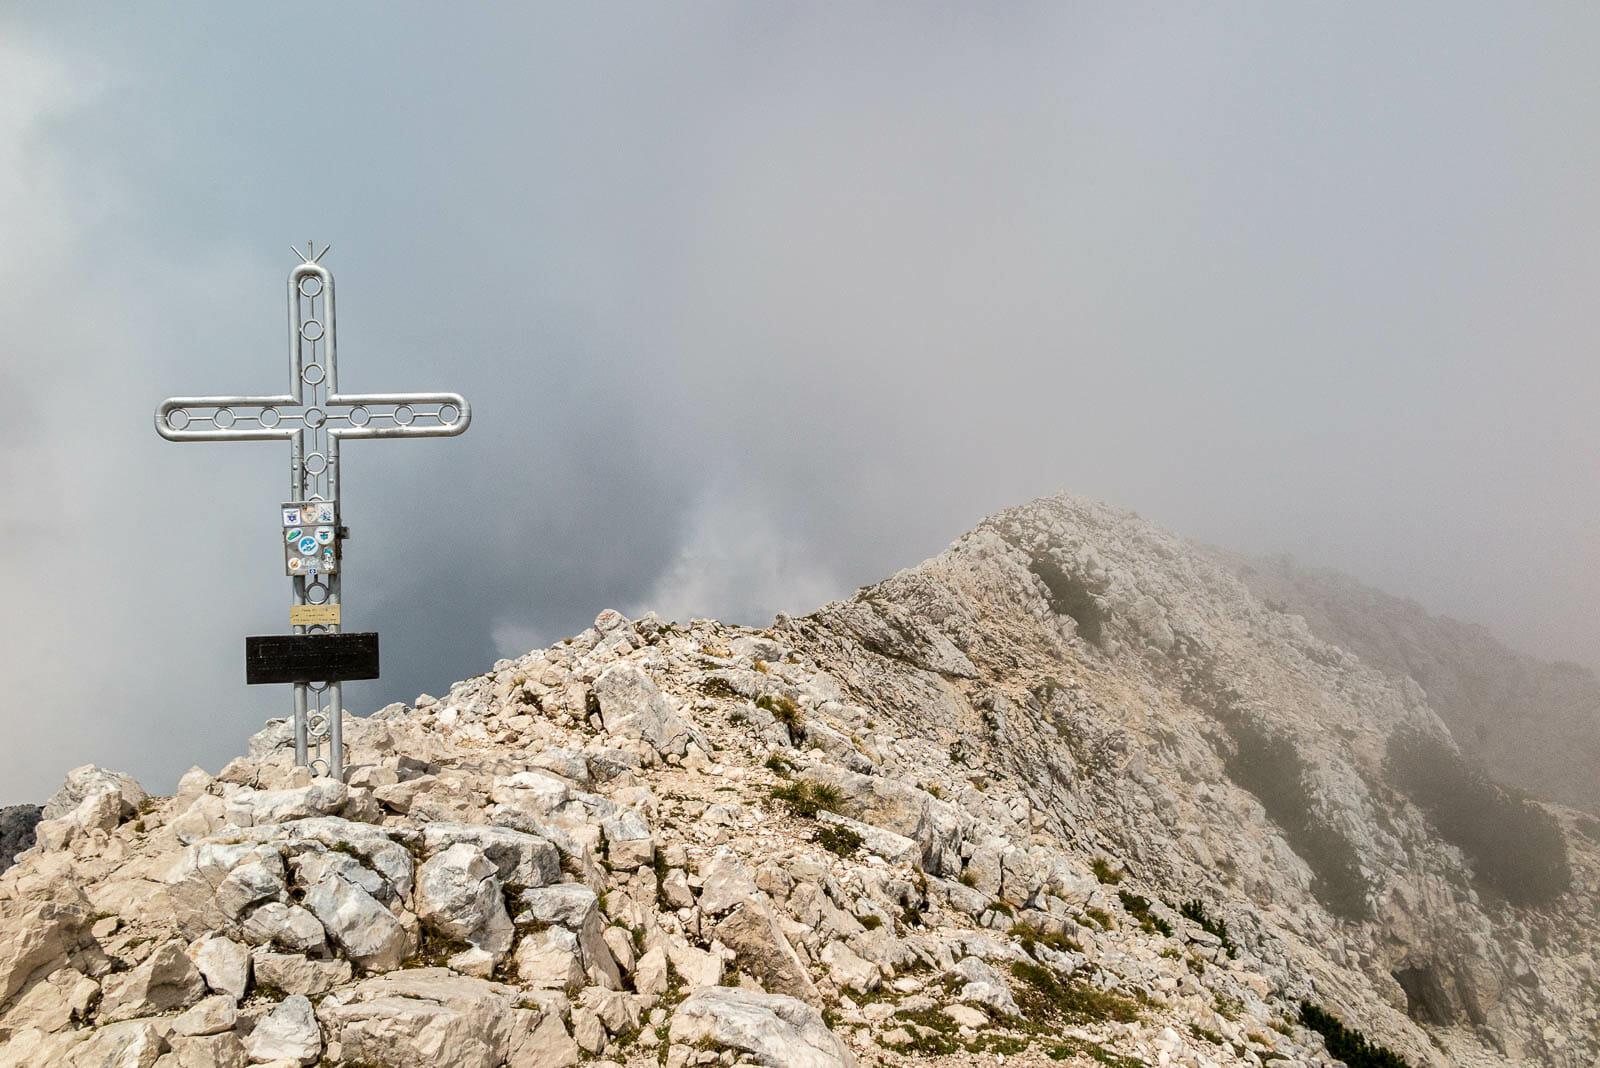 valdritta peak monte baldo